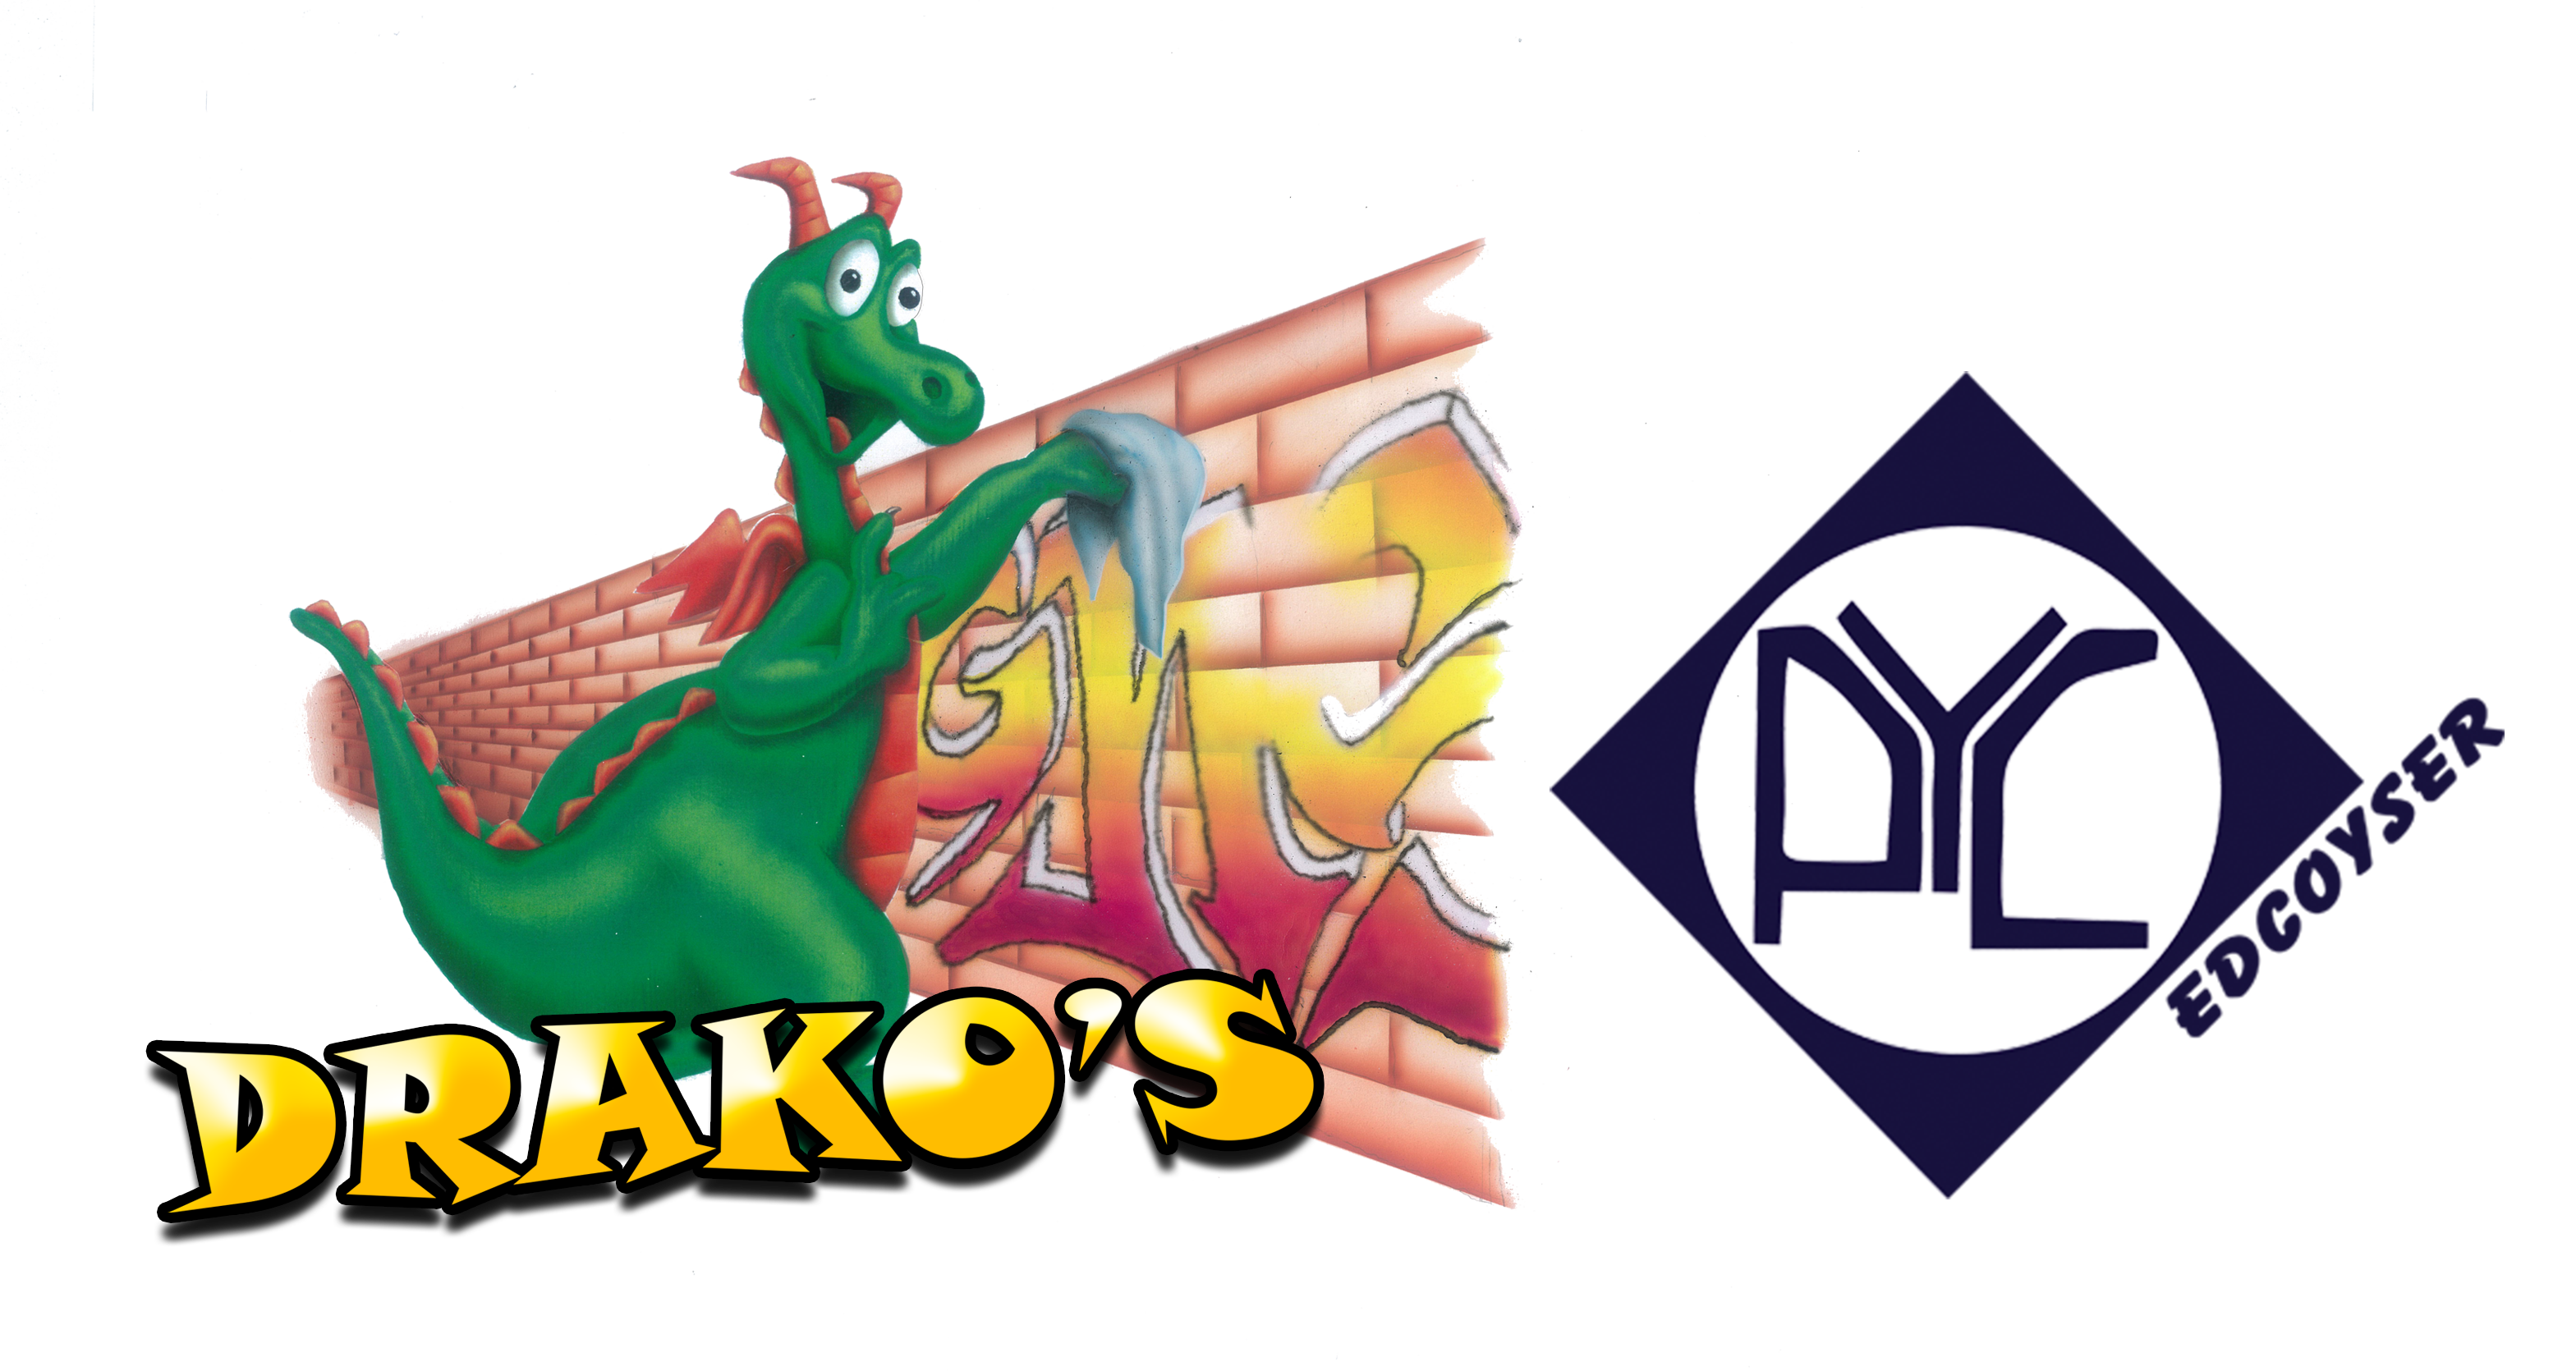 Drakos.es